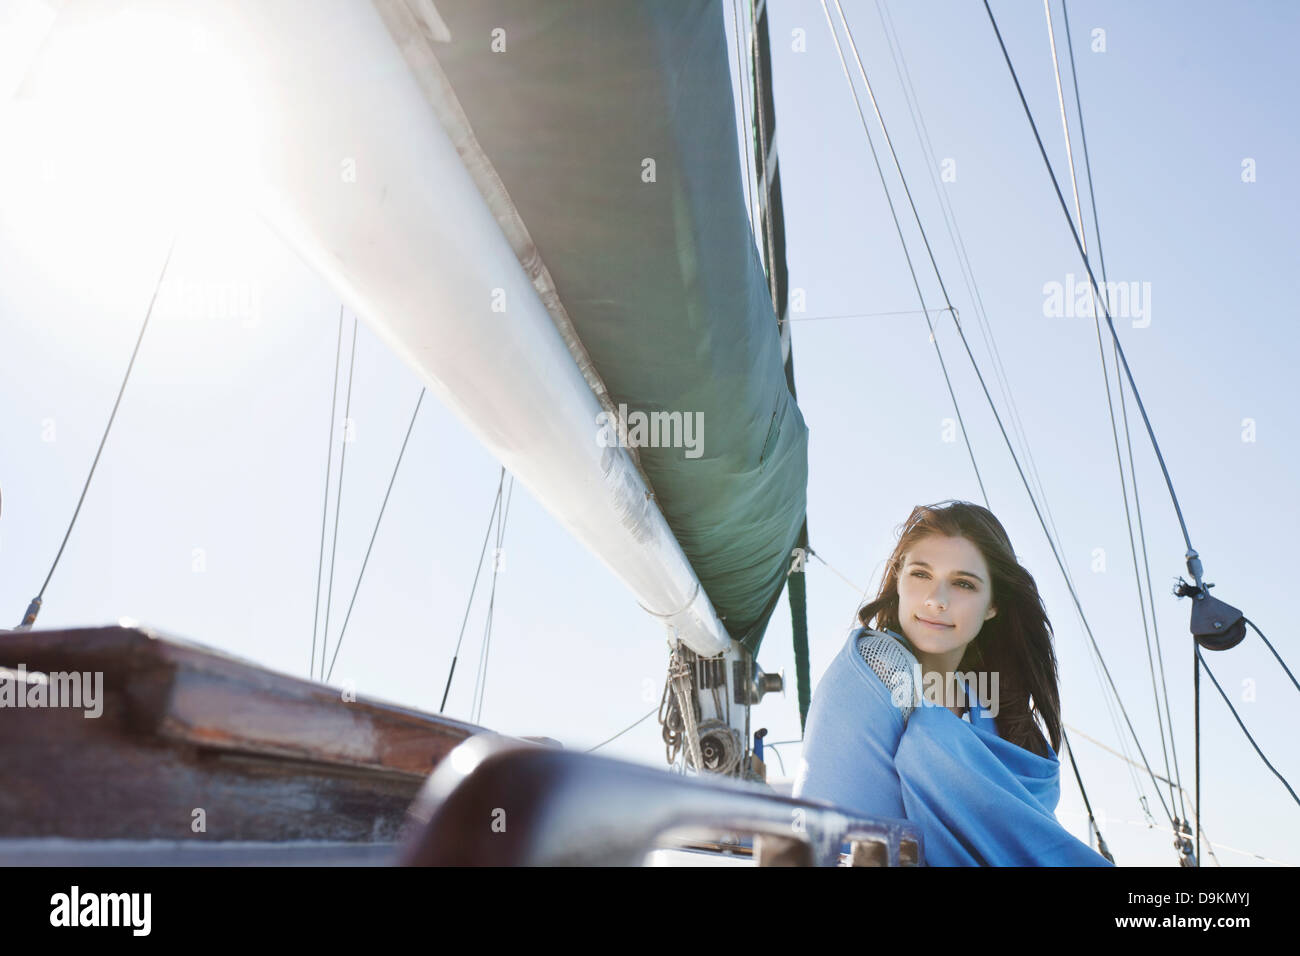 Junge Brünette Frau auf Yacht in Decke gehüllt Stockbild